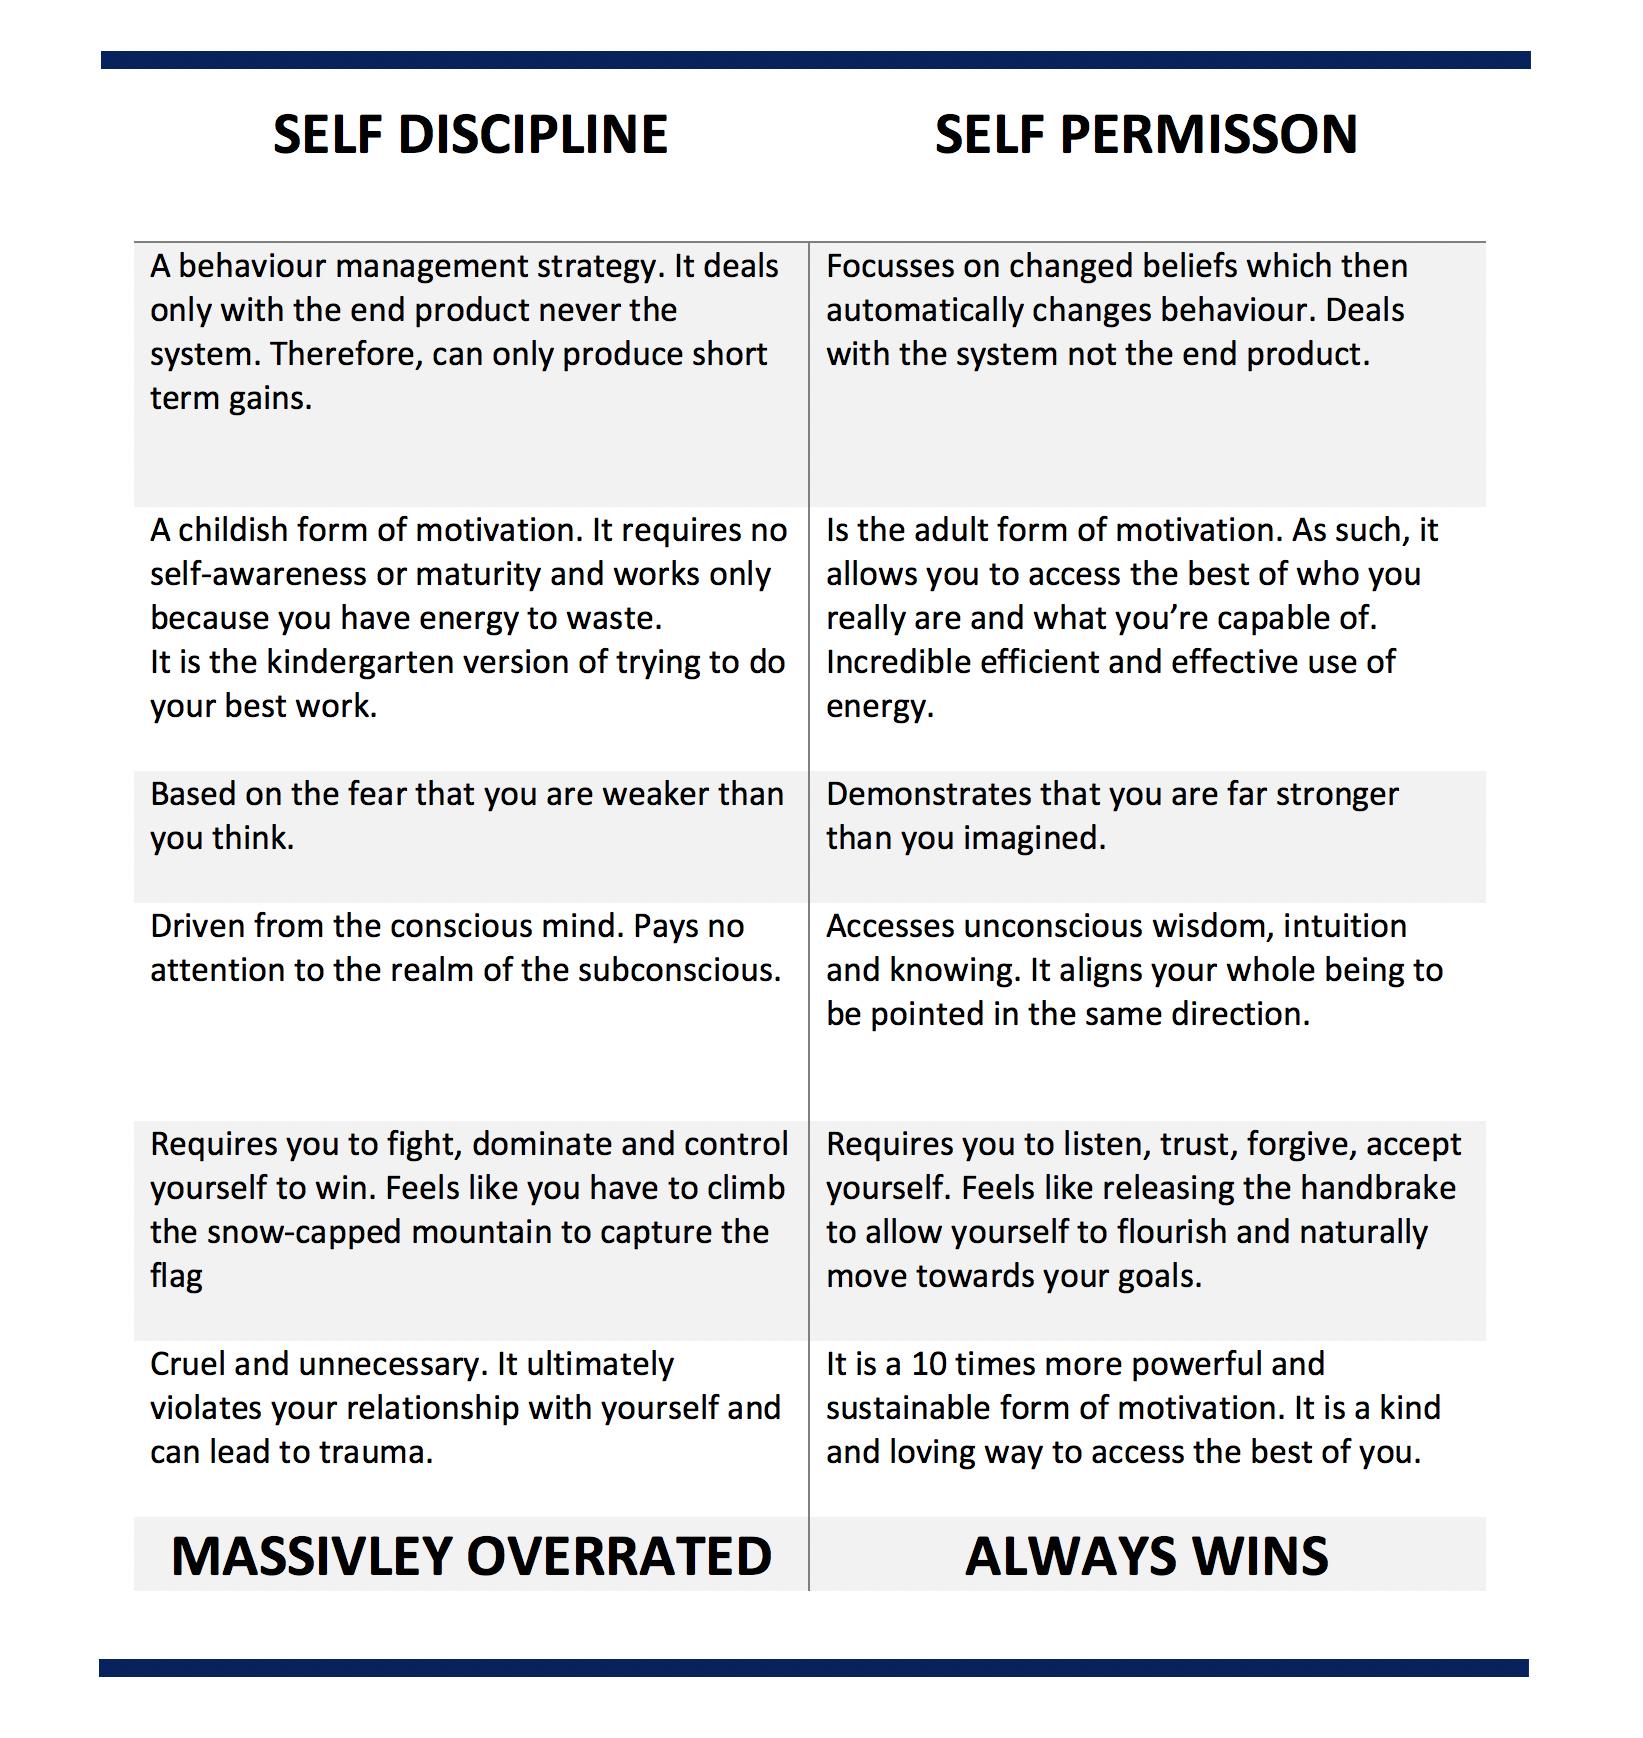 self-discipline-v-self-permission